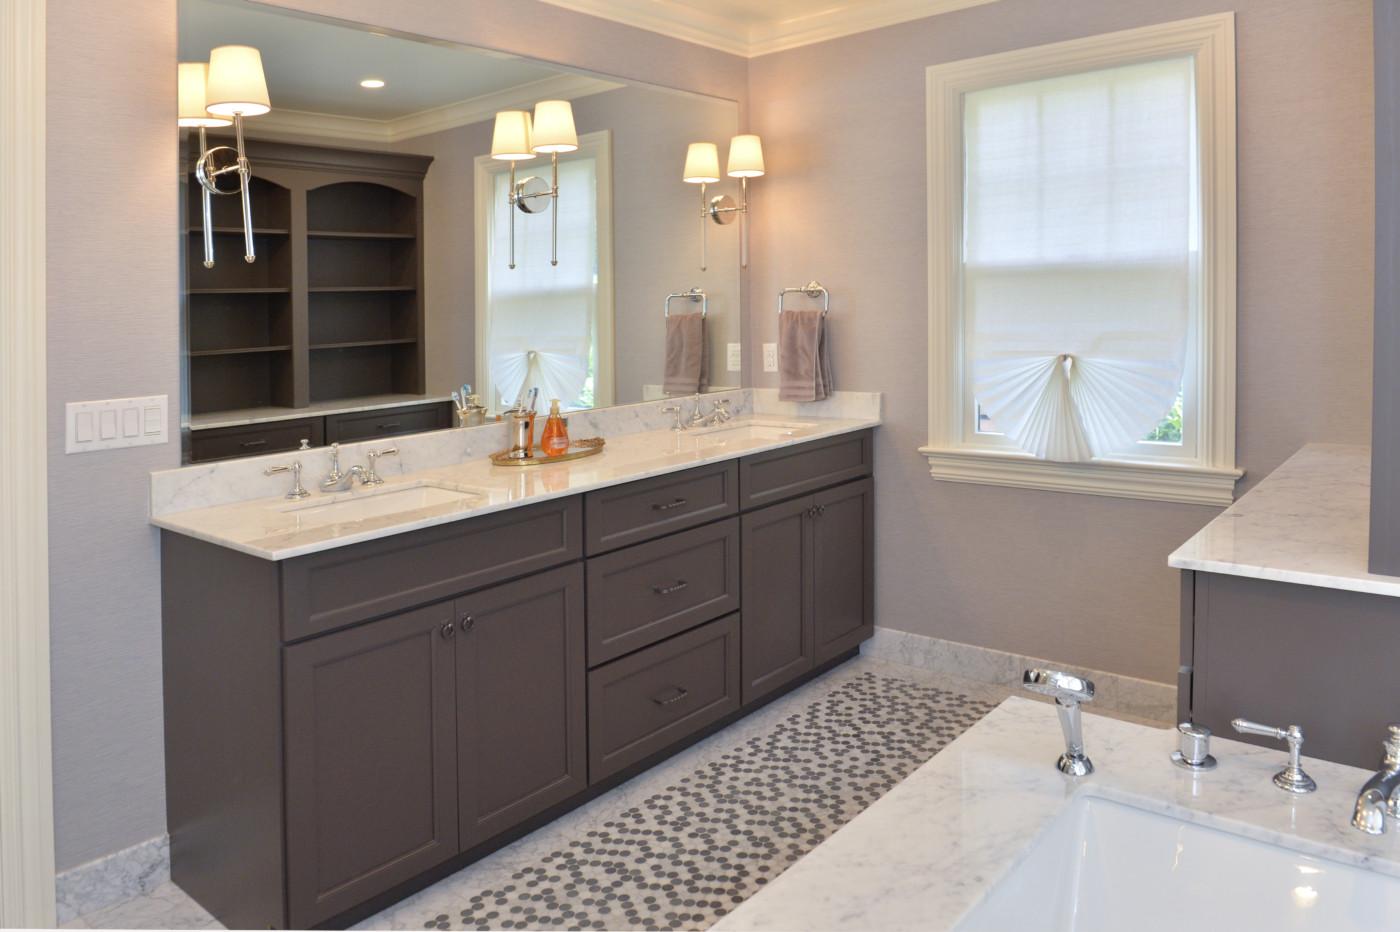 Ridgewood Nj Bathroom Cabinetry Project Designed